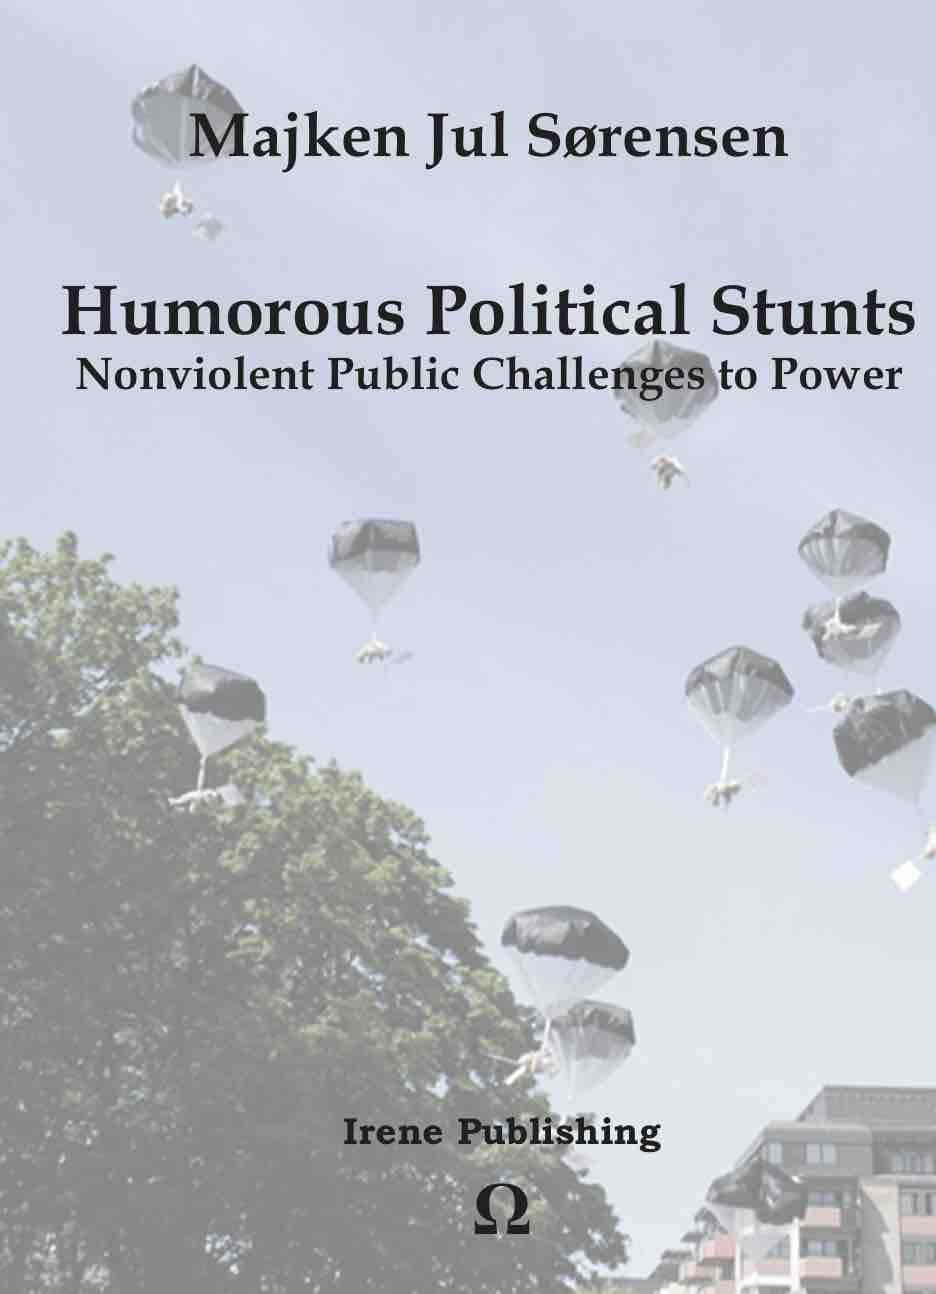 Humorous Political Stunts